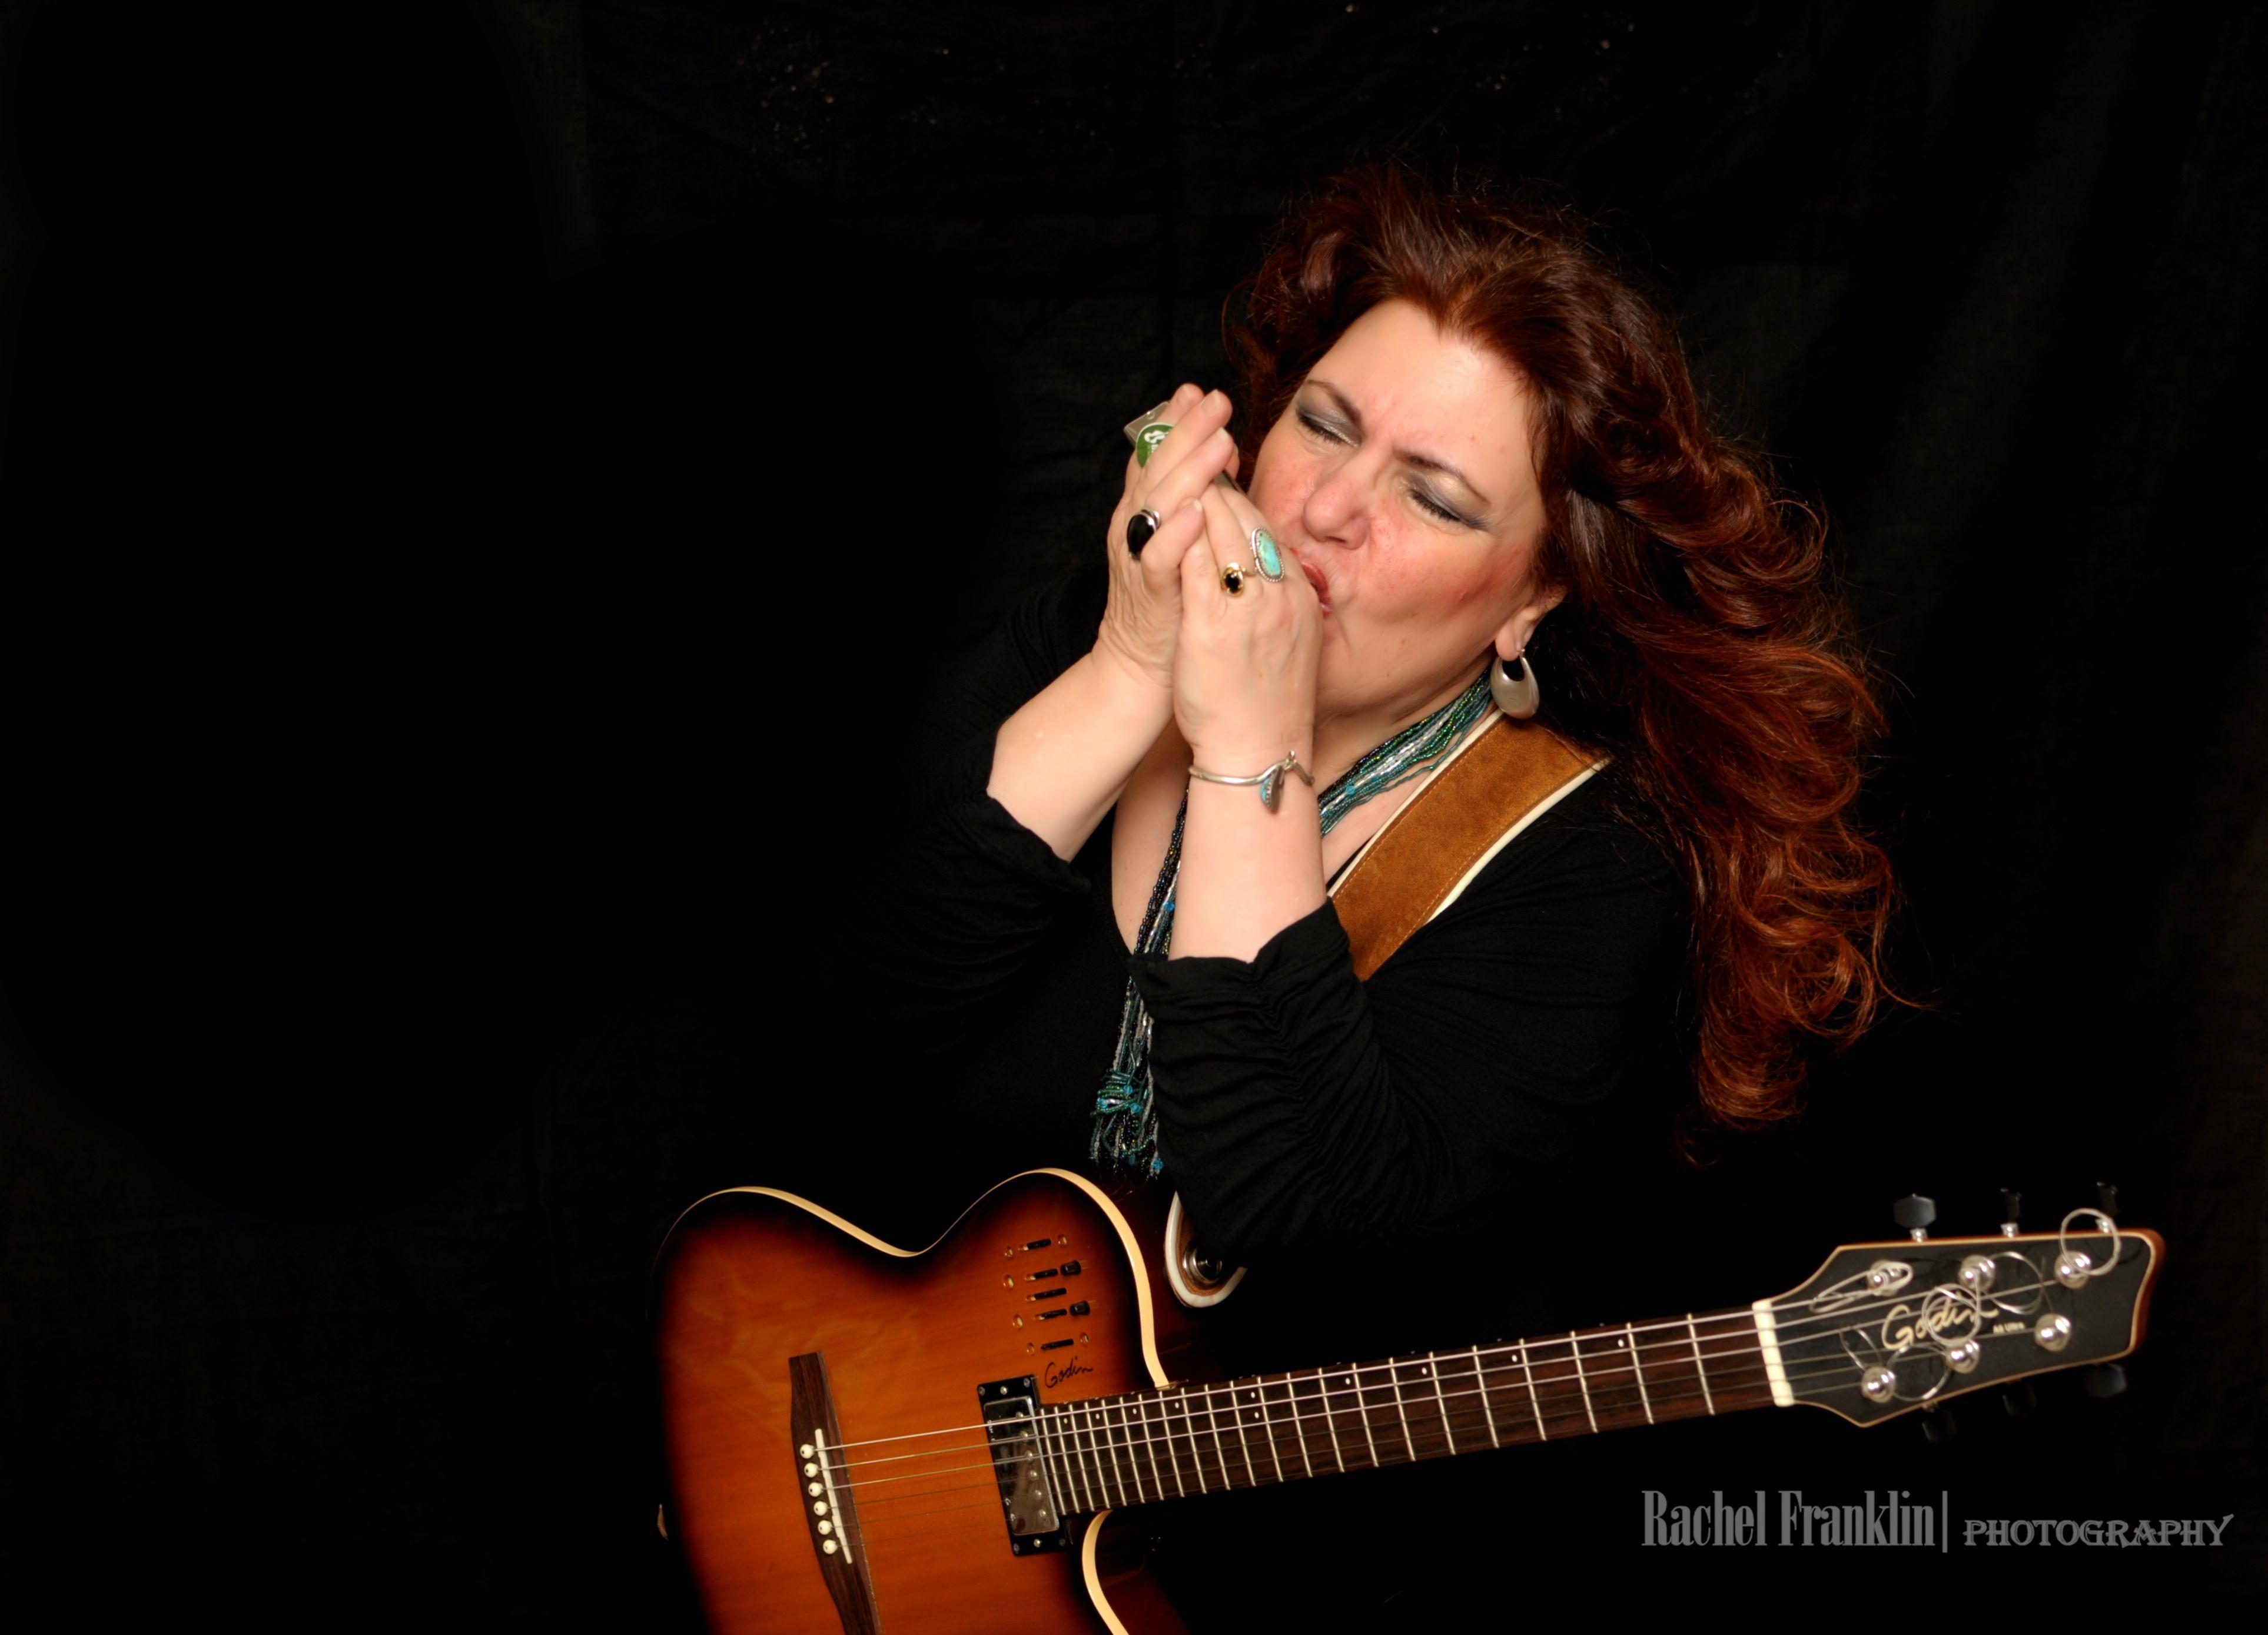 Photos - The Octavia Blues Band